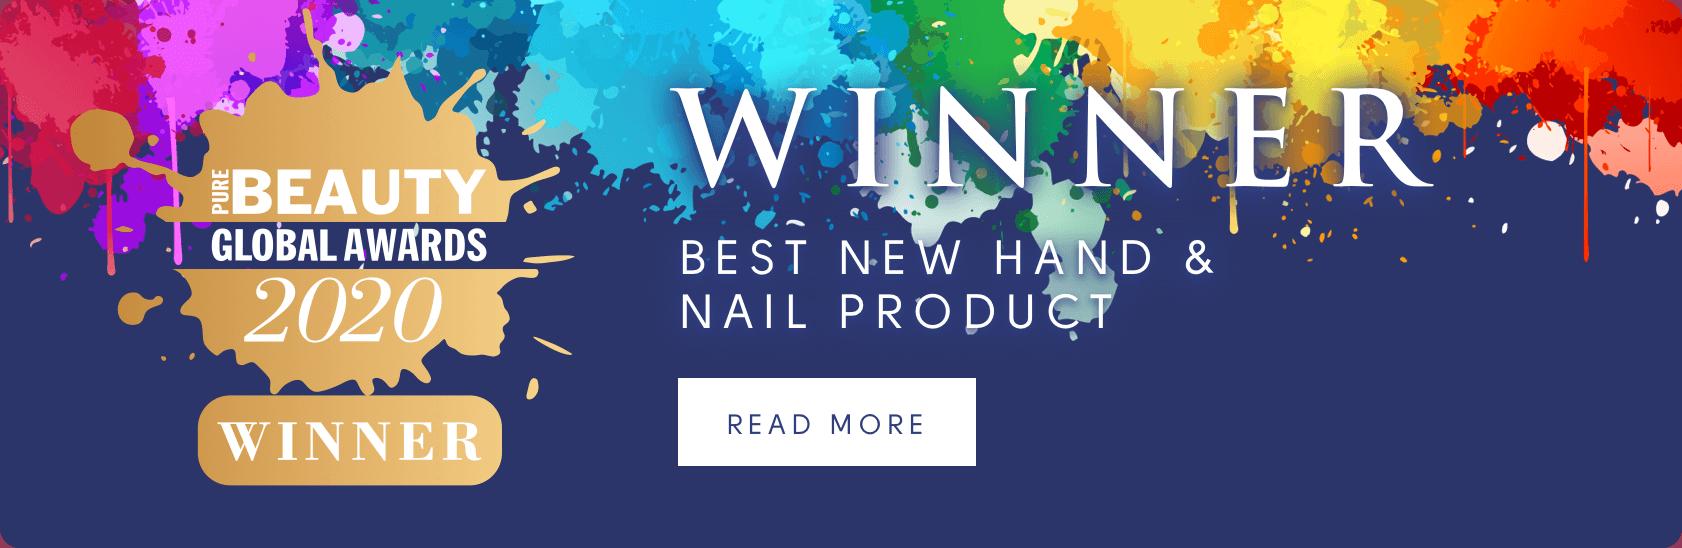 Beauty Awards 2020 Winner - Jersey Honey Intensive Hand Cream